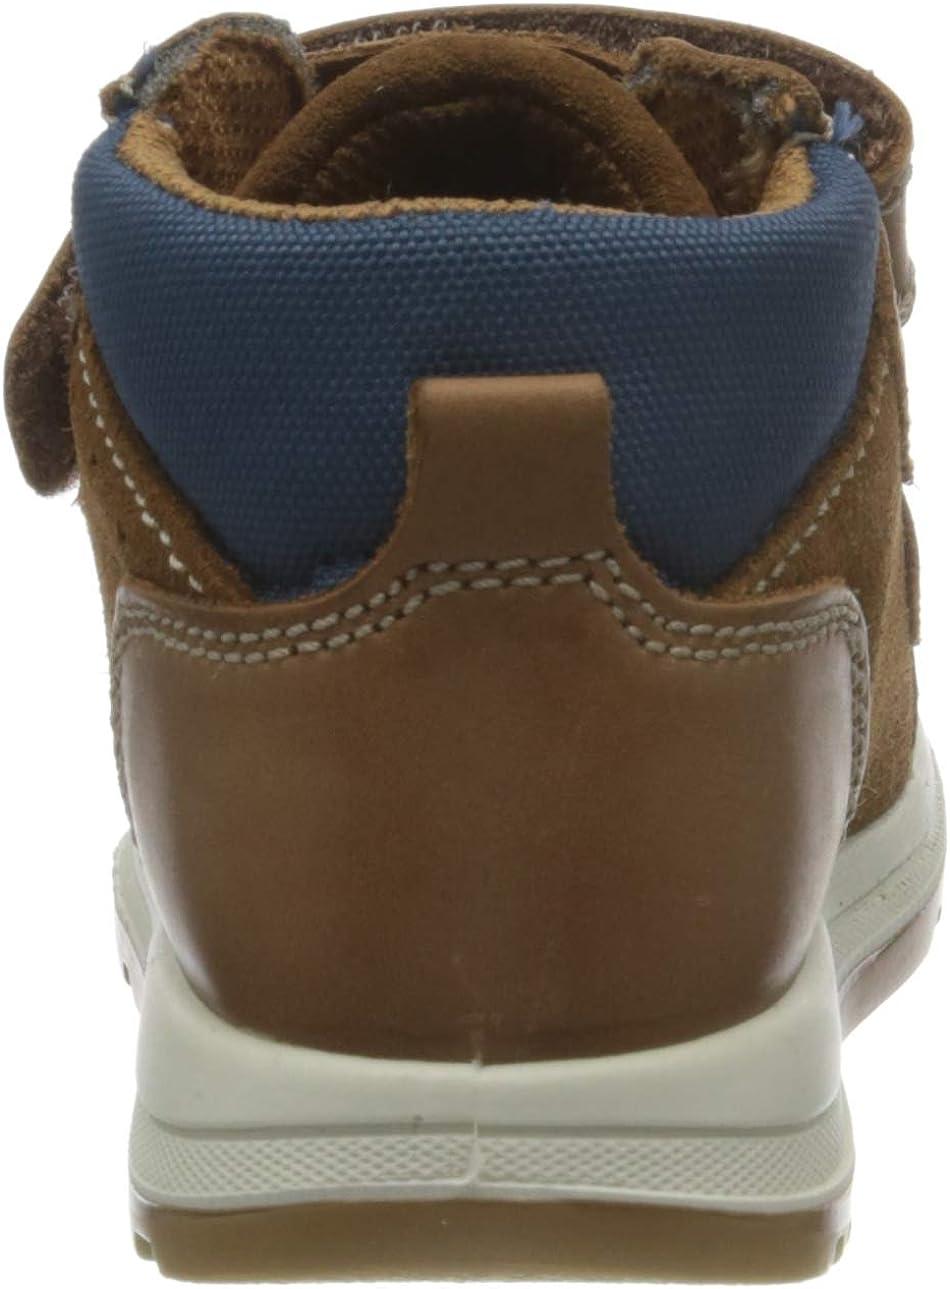 Primigi Pbzgt 63601 Chaussure First Walker Mixte b/éb/é